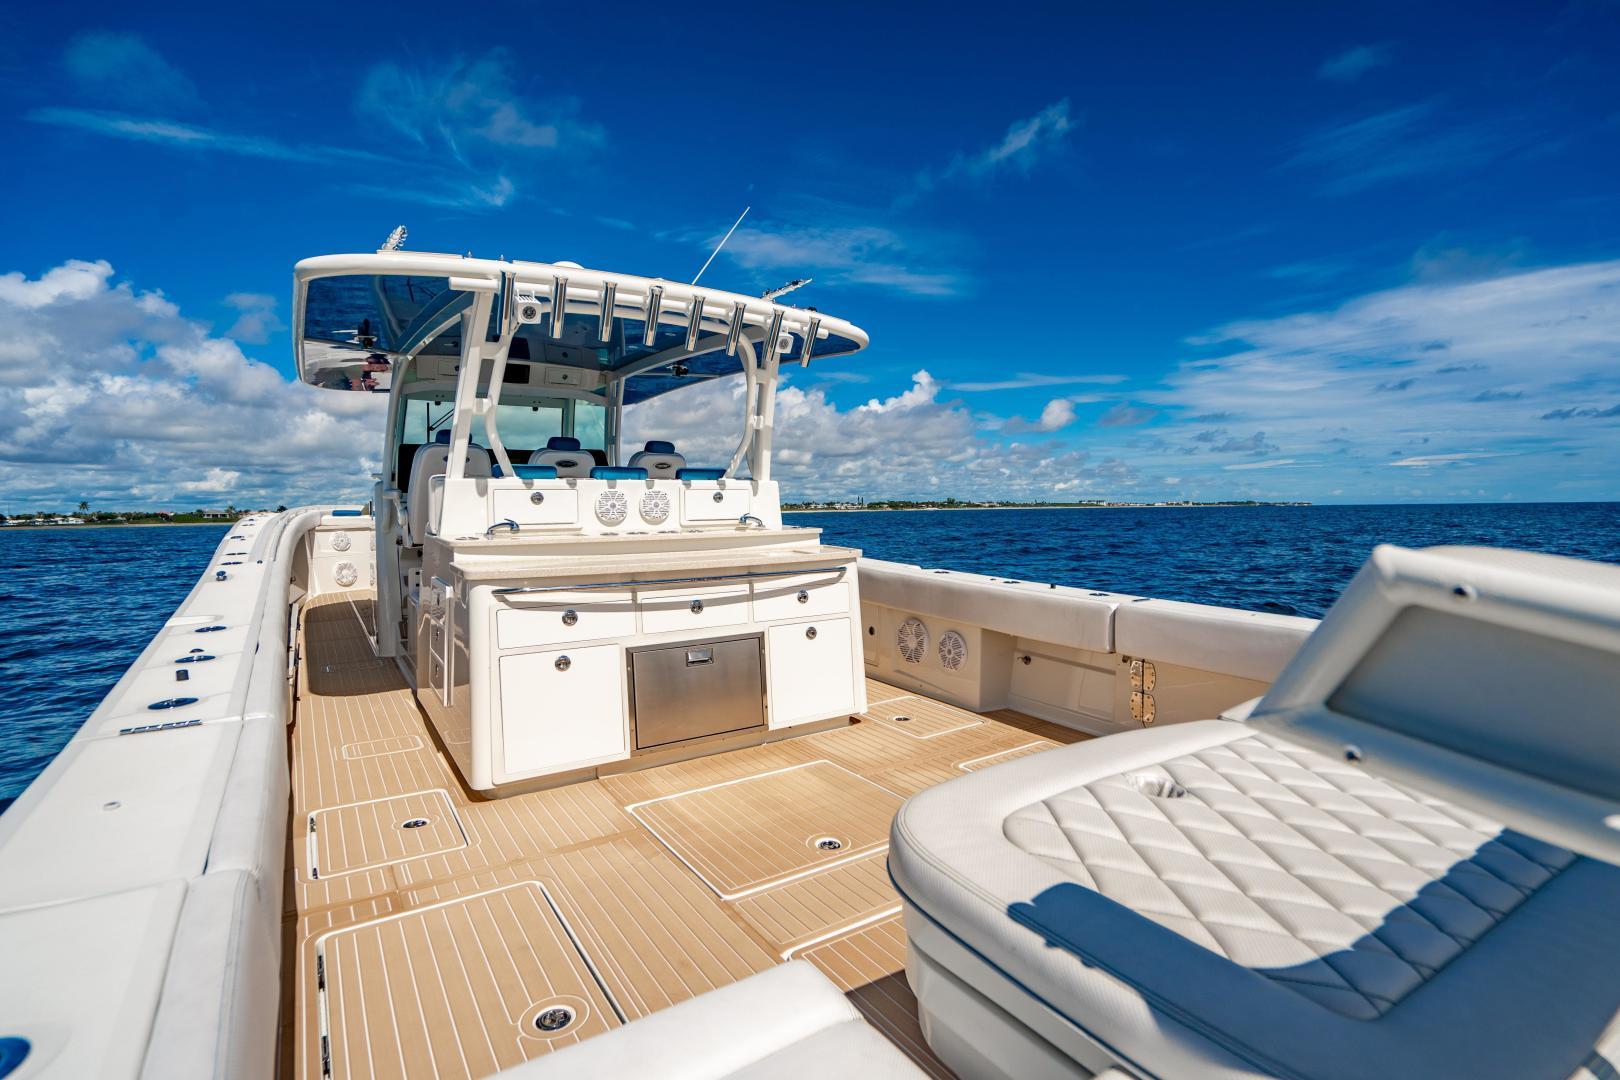 HCB-Suenos 2016-Salt Shaker Ft. Lauderdale-Florida-United States-1548645 | Thumbnail